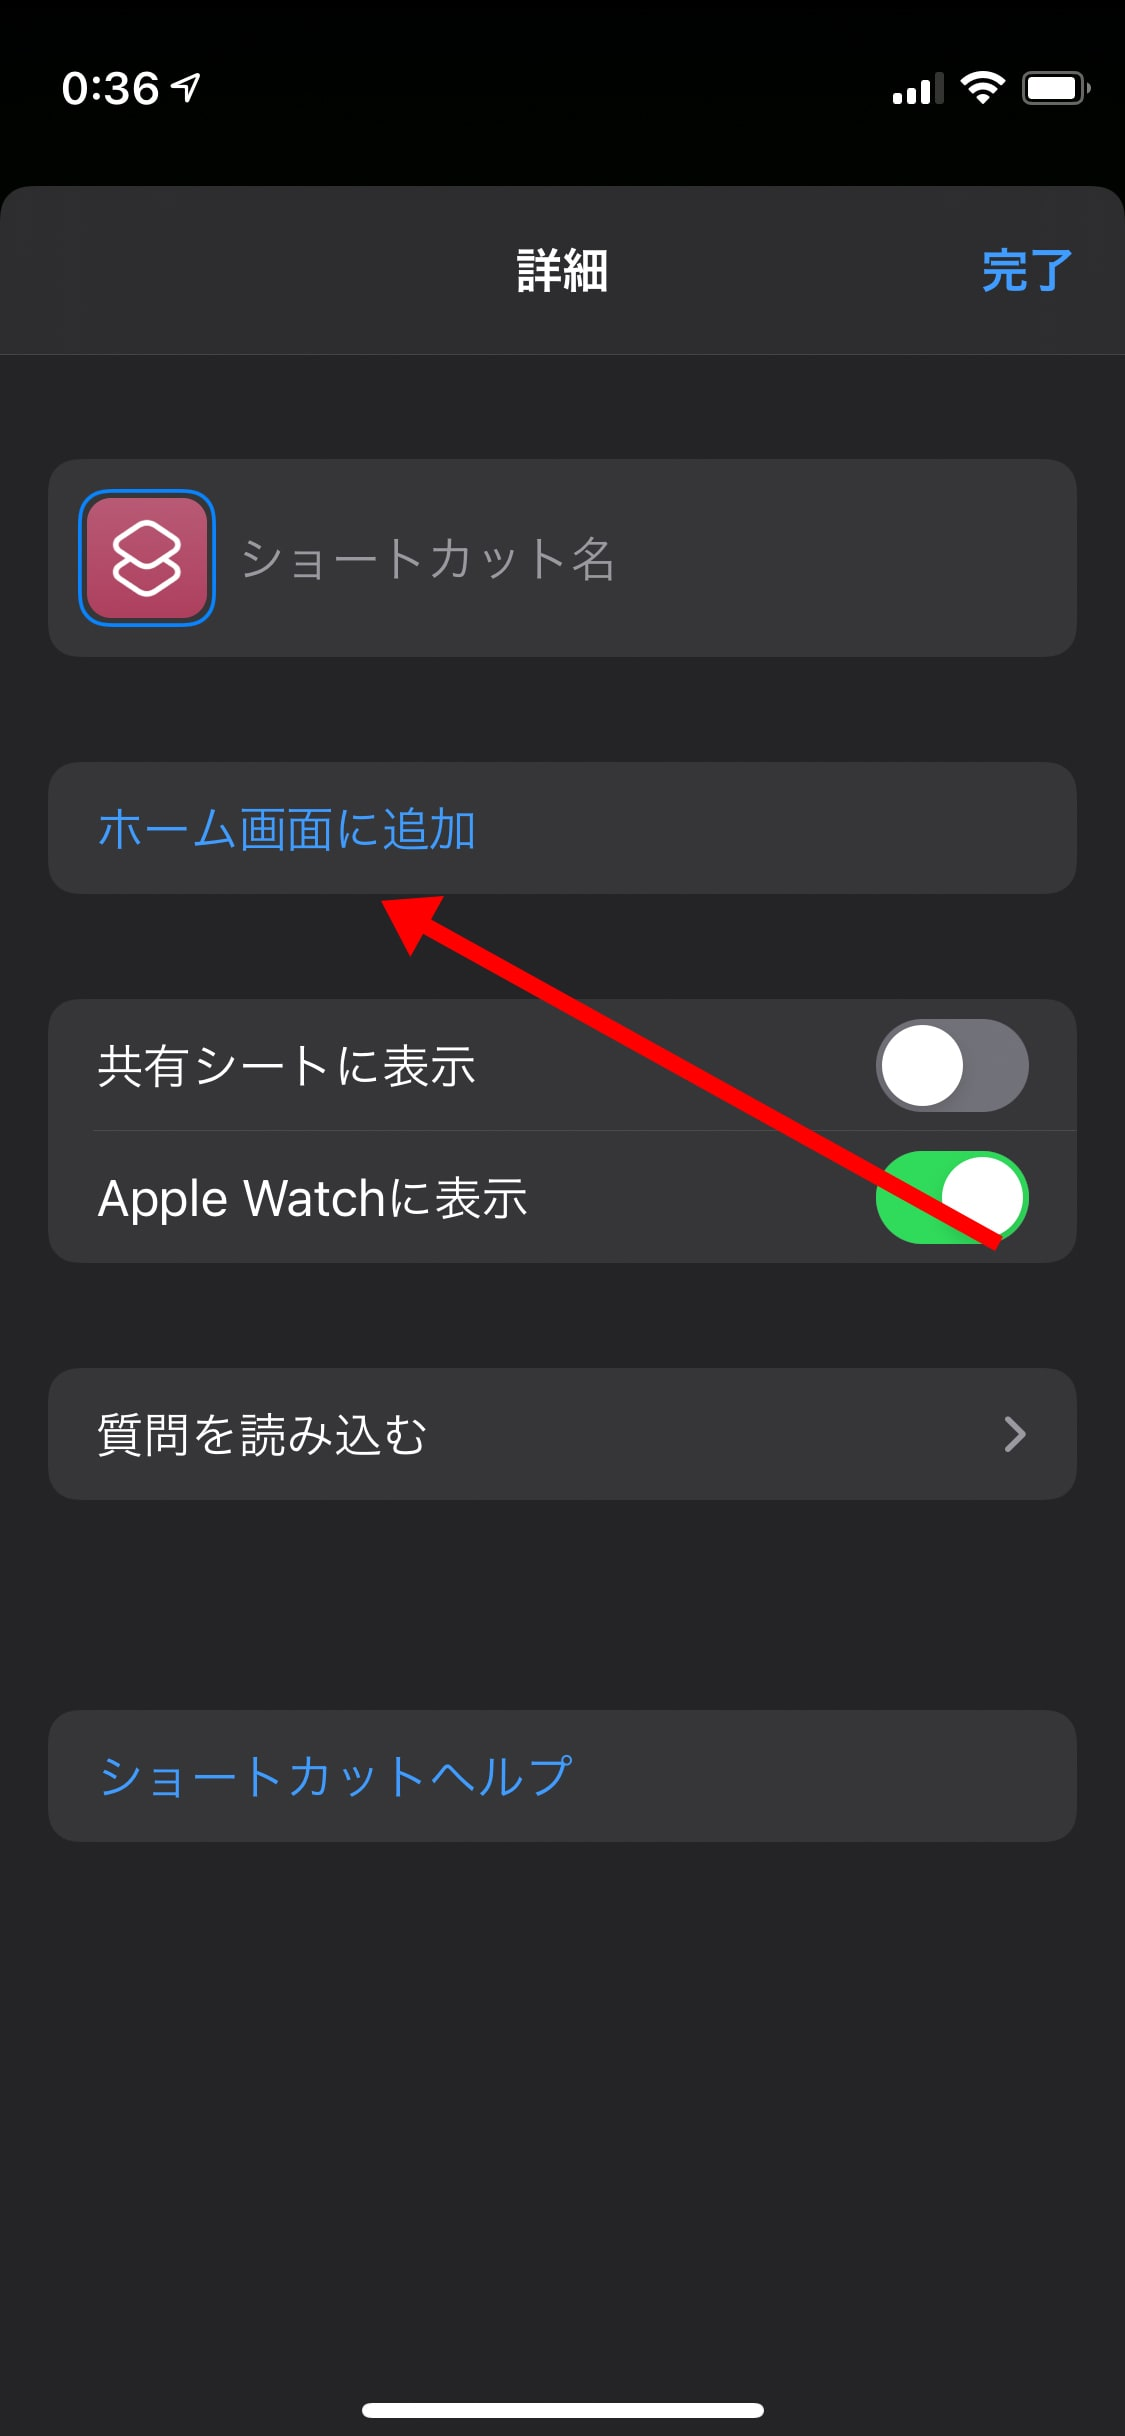 iPhoneショートカットアプリを使ってアイコンを変更する方法